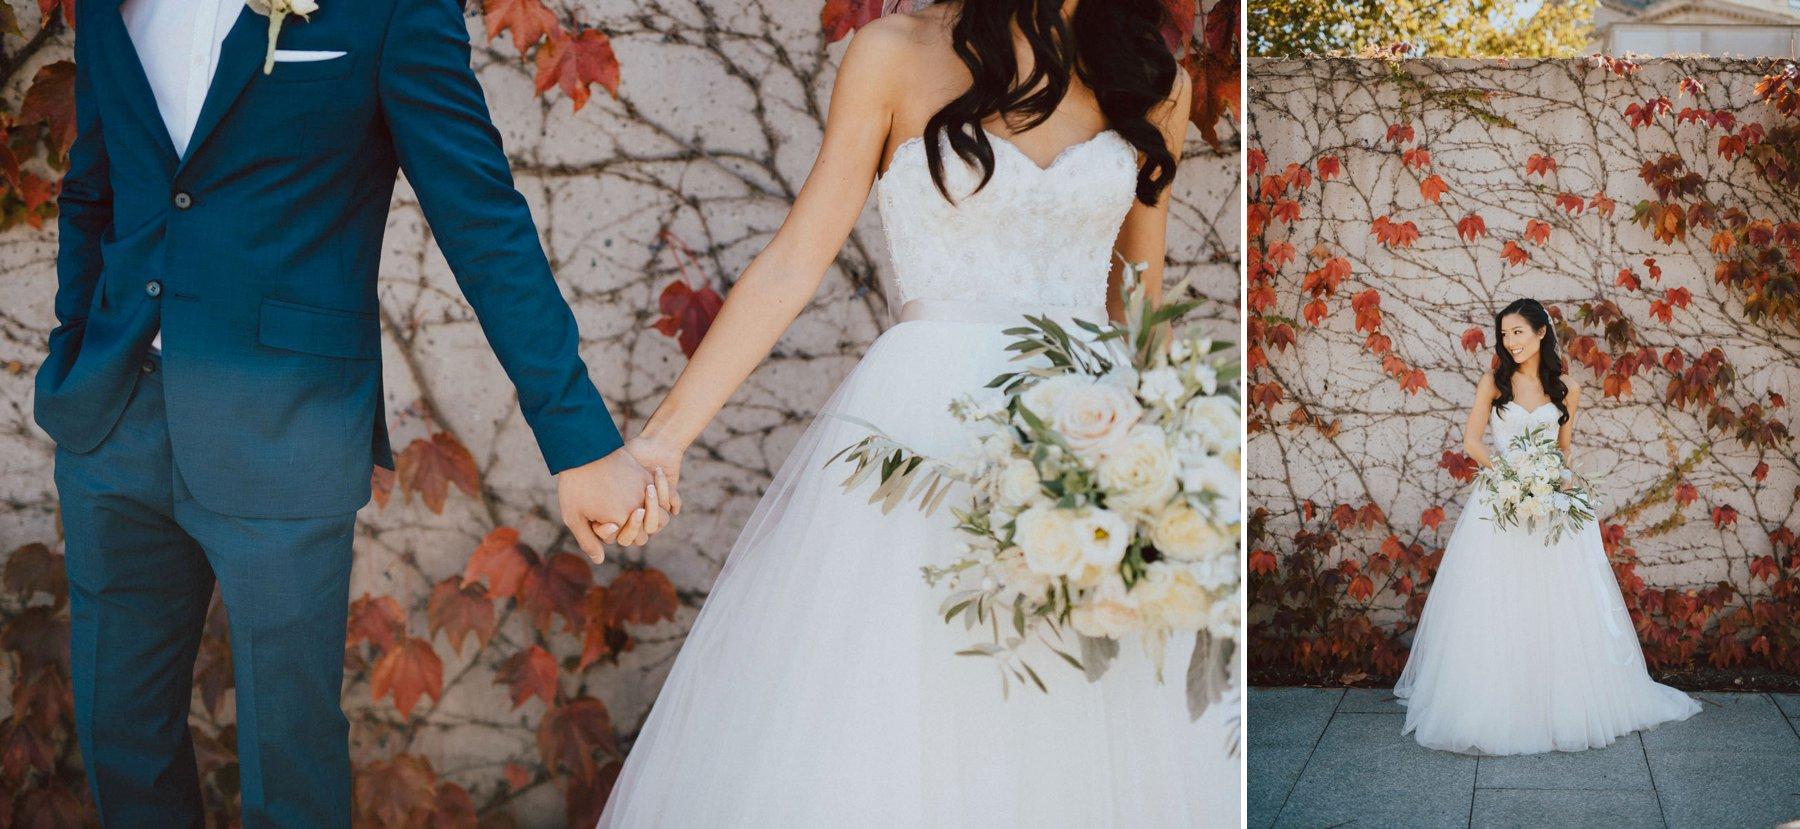 philadelphia-wedding-photographer-77.jpg